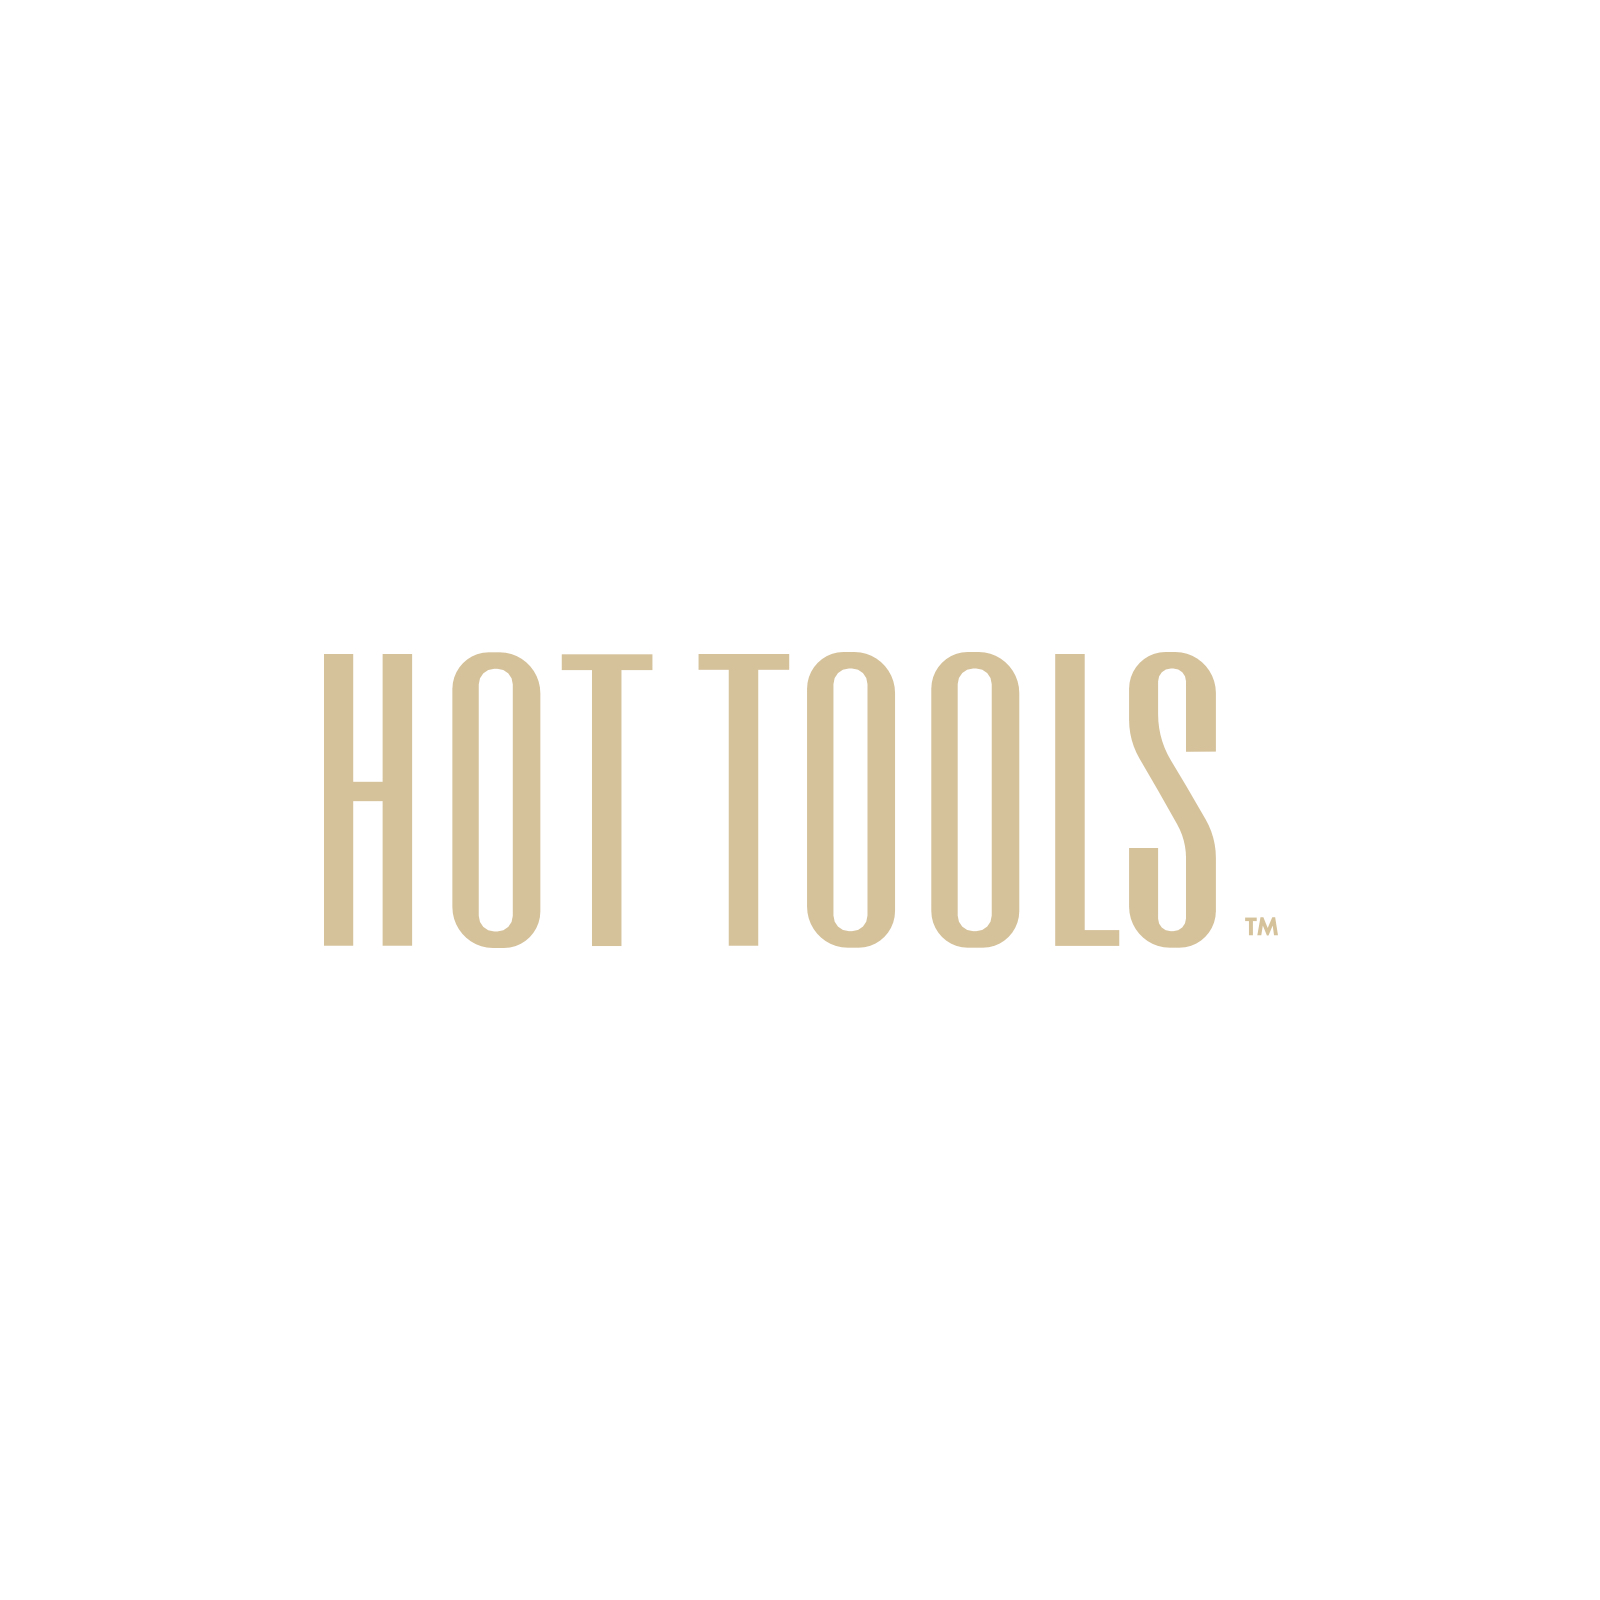 Hot Tools® Signature Series Salon Turbo Ionic® Dryer, 1875 watts